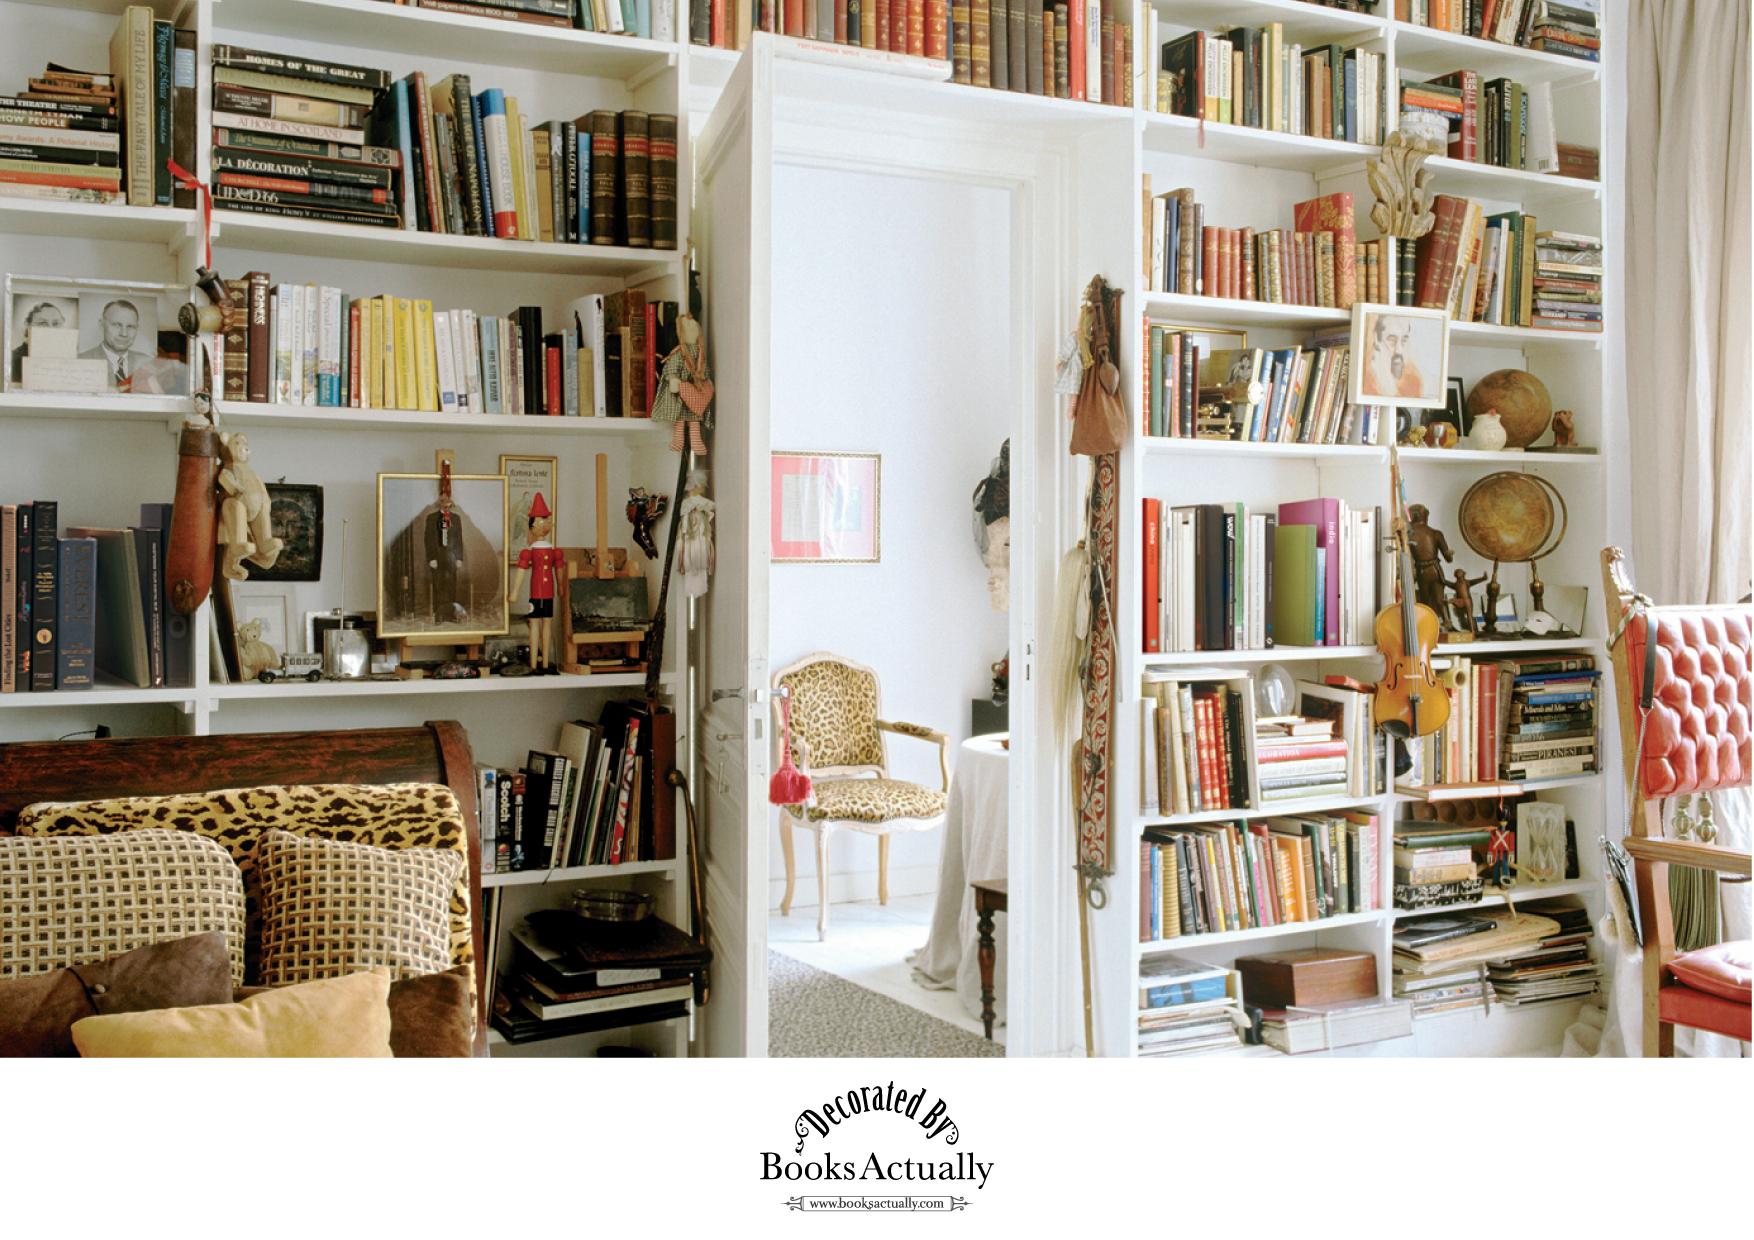 BooksActually-02.jpg